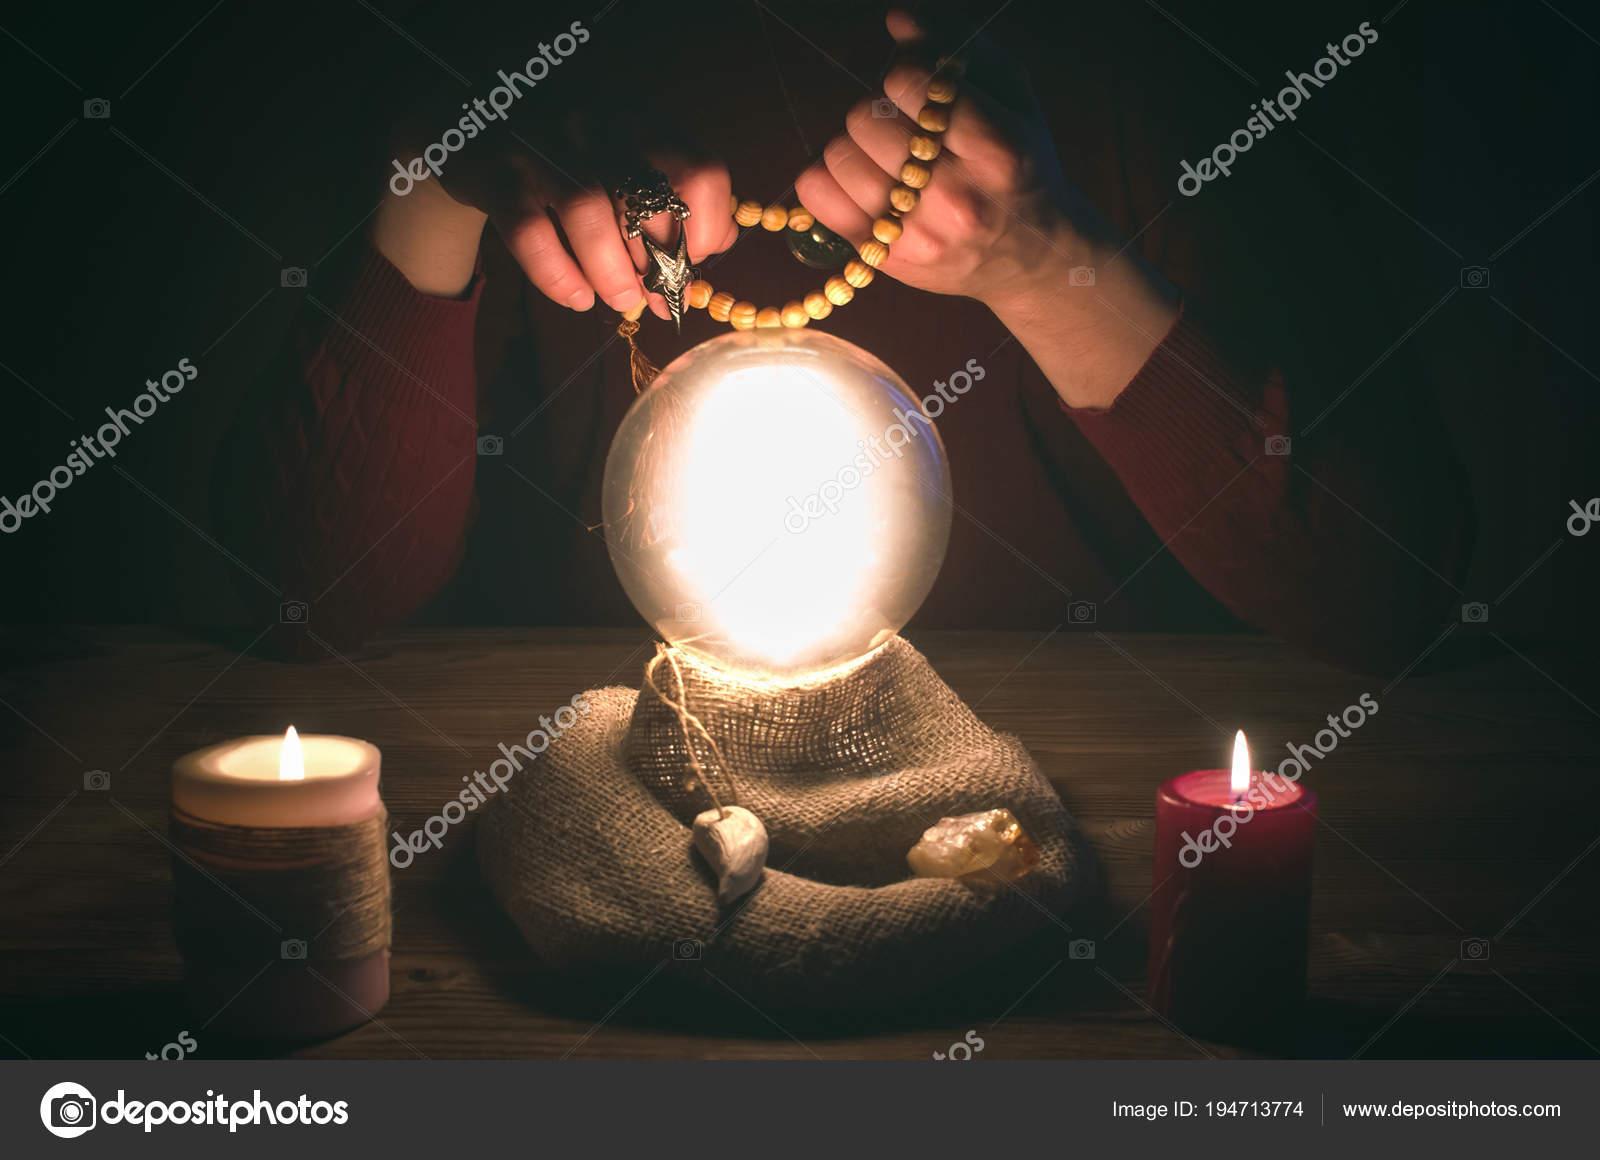 Crystal Ball Fortune Teller Hands Divination Concept